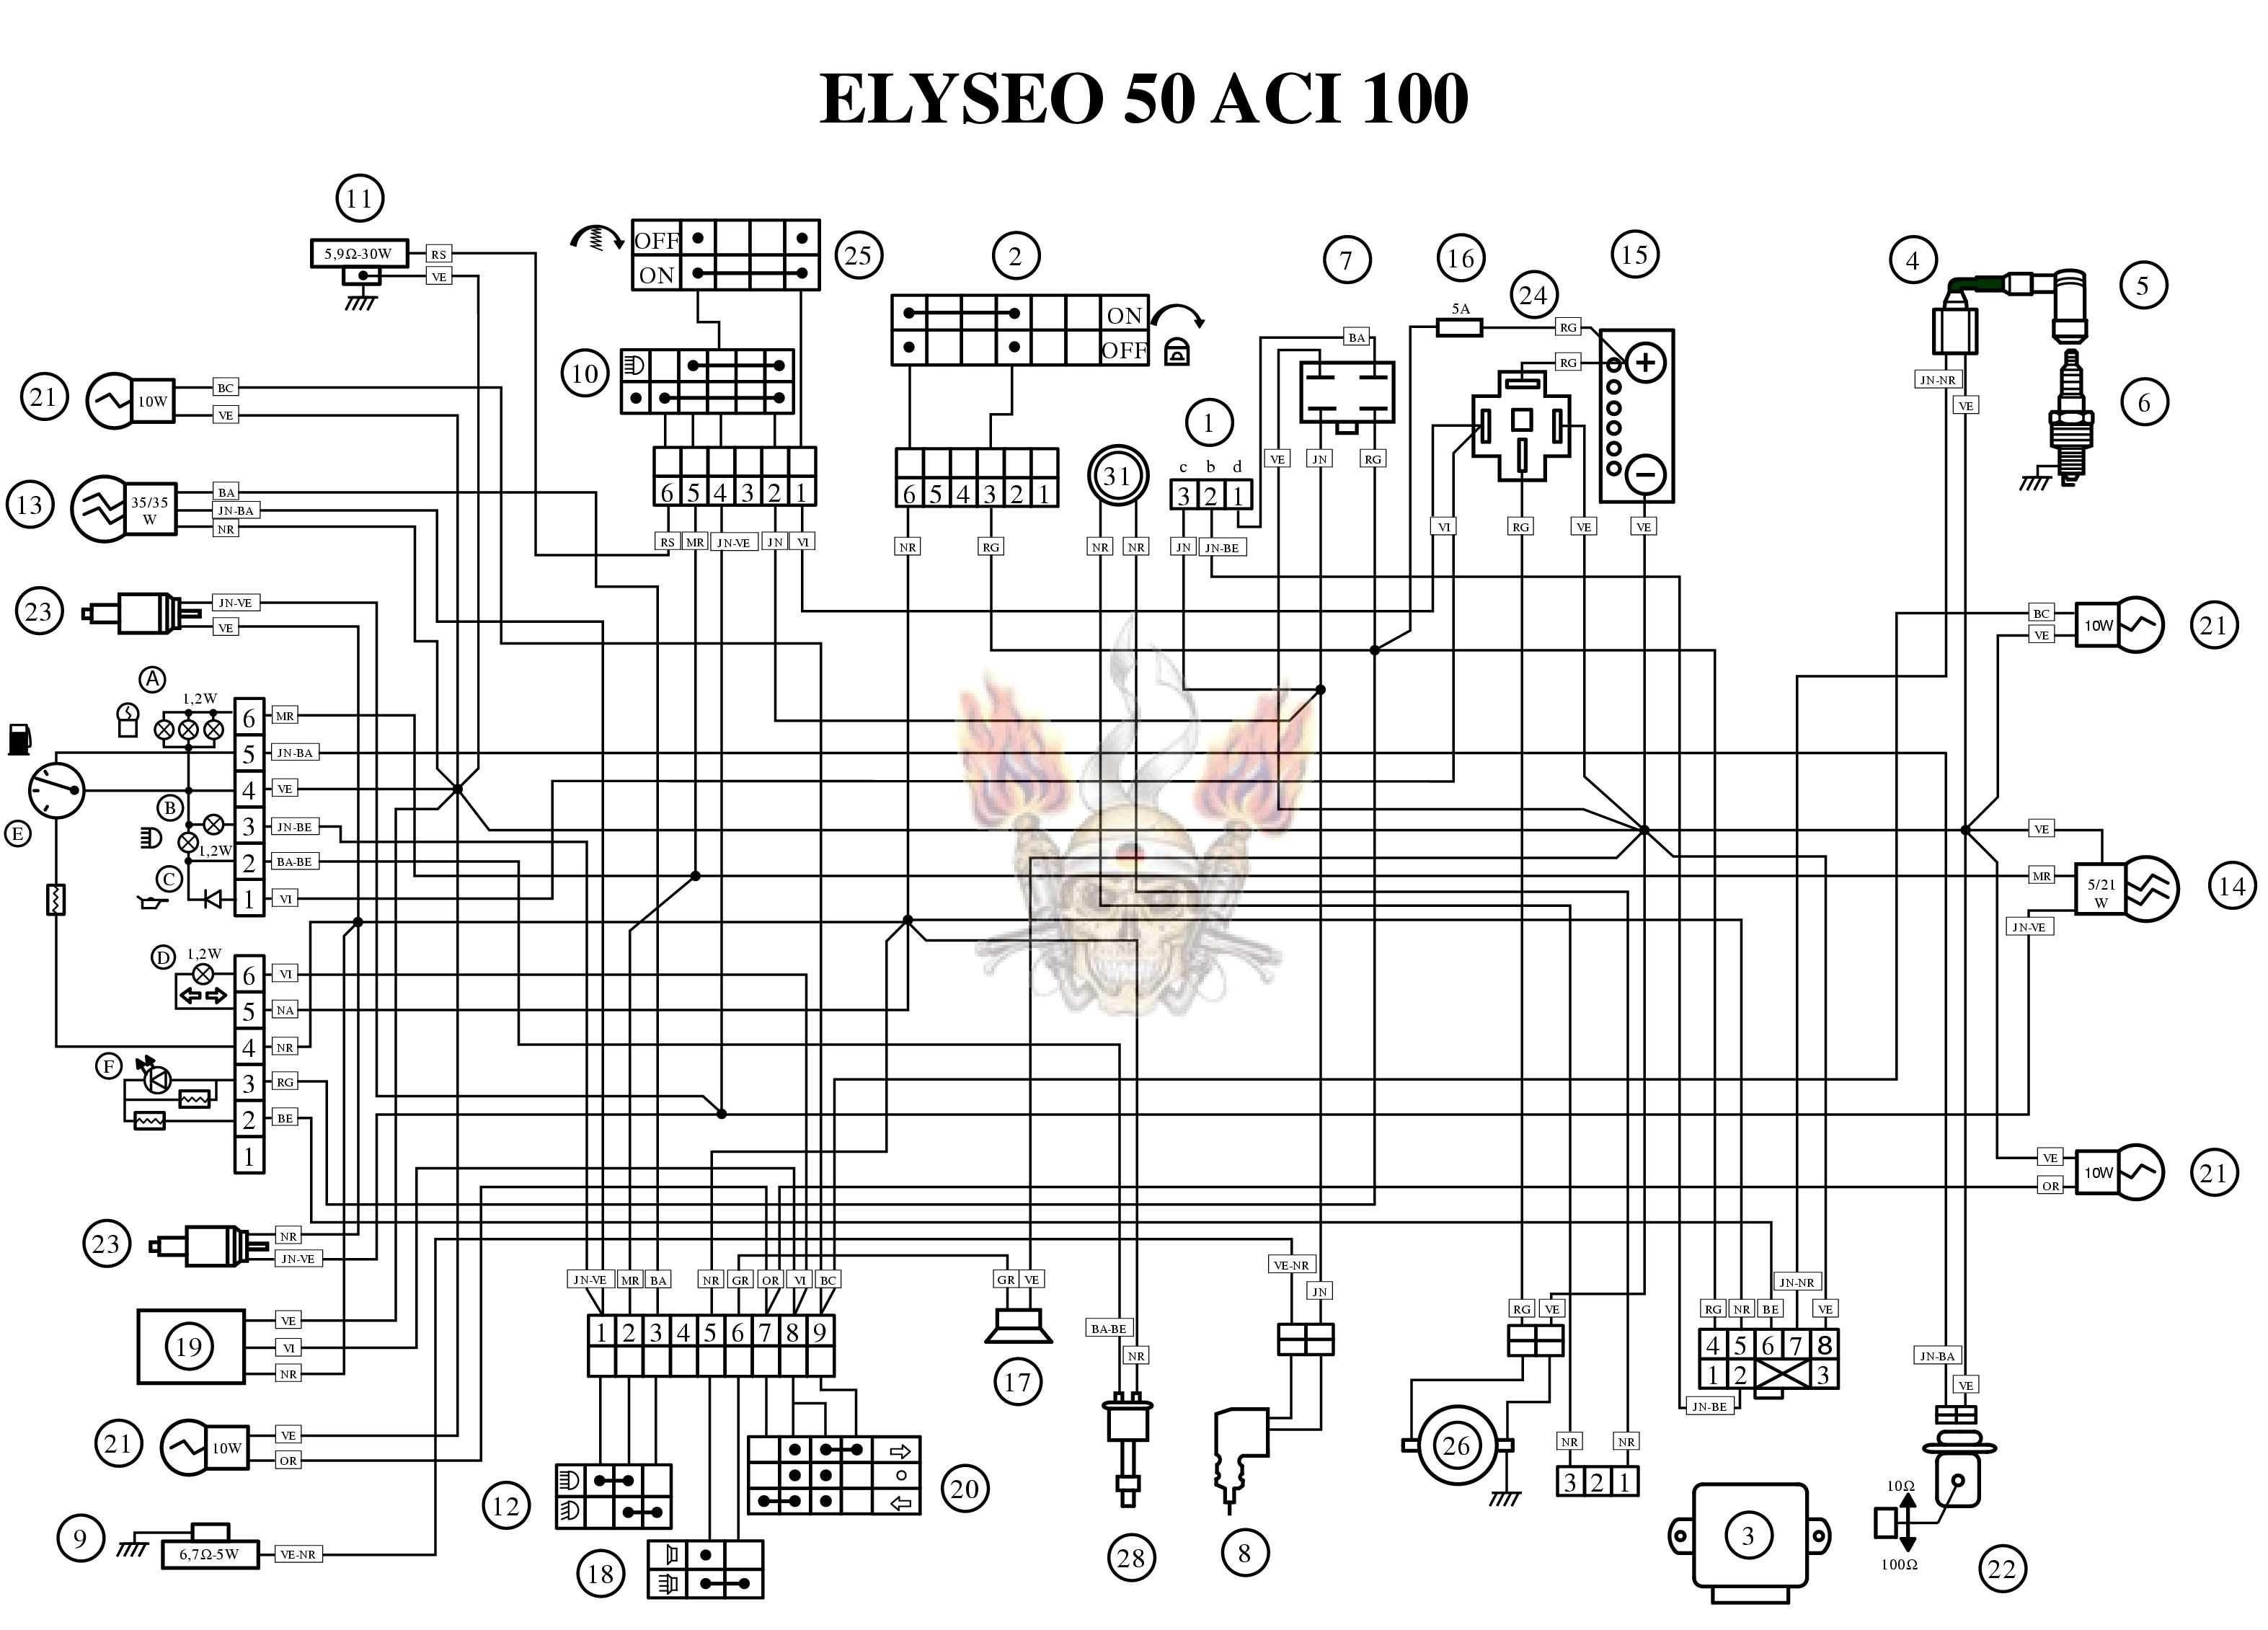 Peugeot Elyseo 50 Wiring Diagram Circuit Wiring Diagrams Light Switch Wiring Diagram Light Switch Wiring Diagram Electrical Wiring Diagram Diagram Peugeot